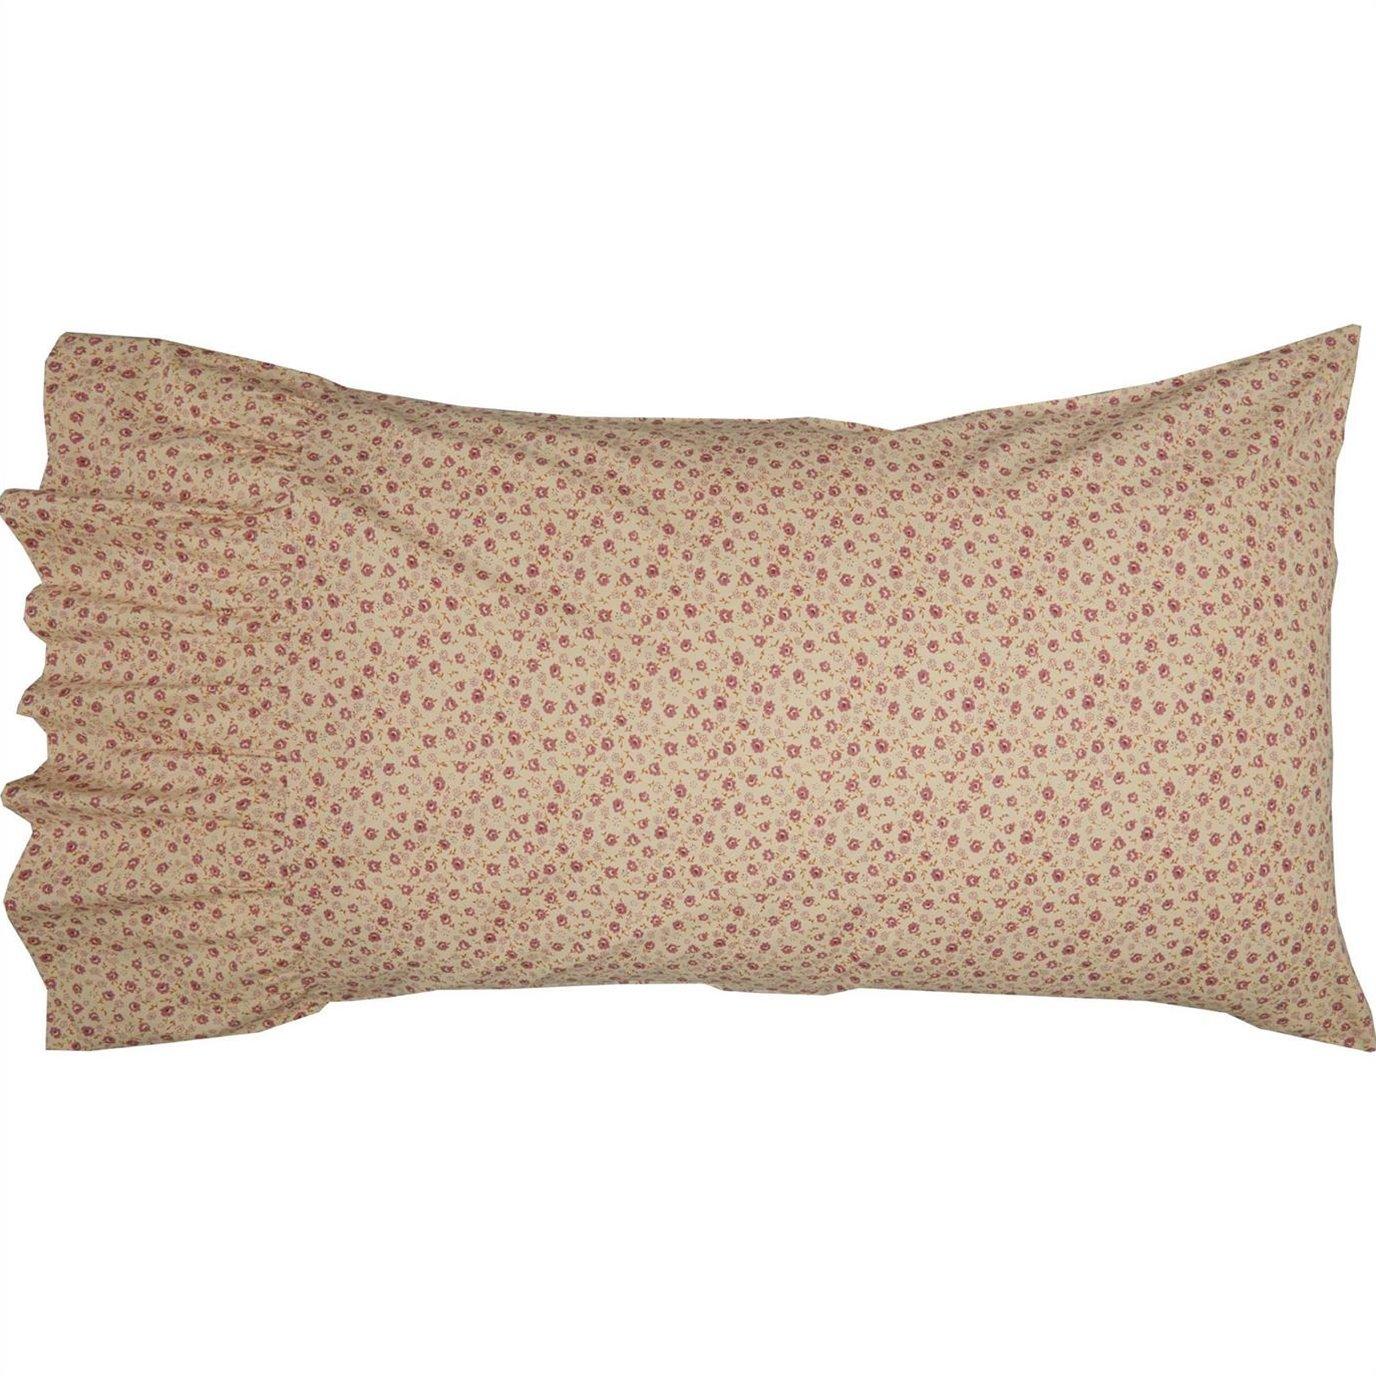 Camilia Ruffled Standard Pillow Case Set of 2 21x26+8